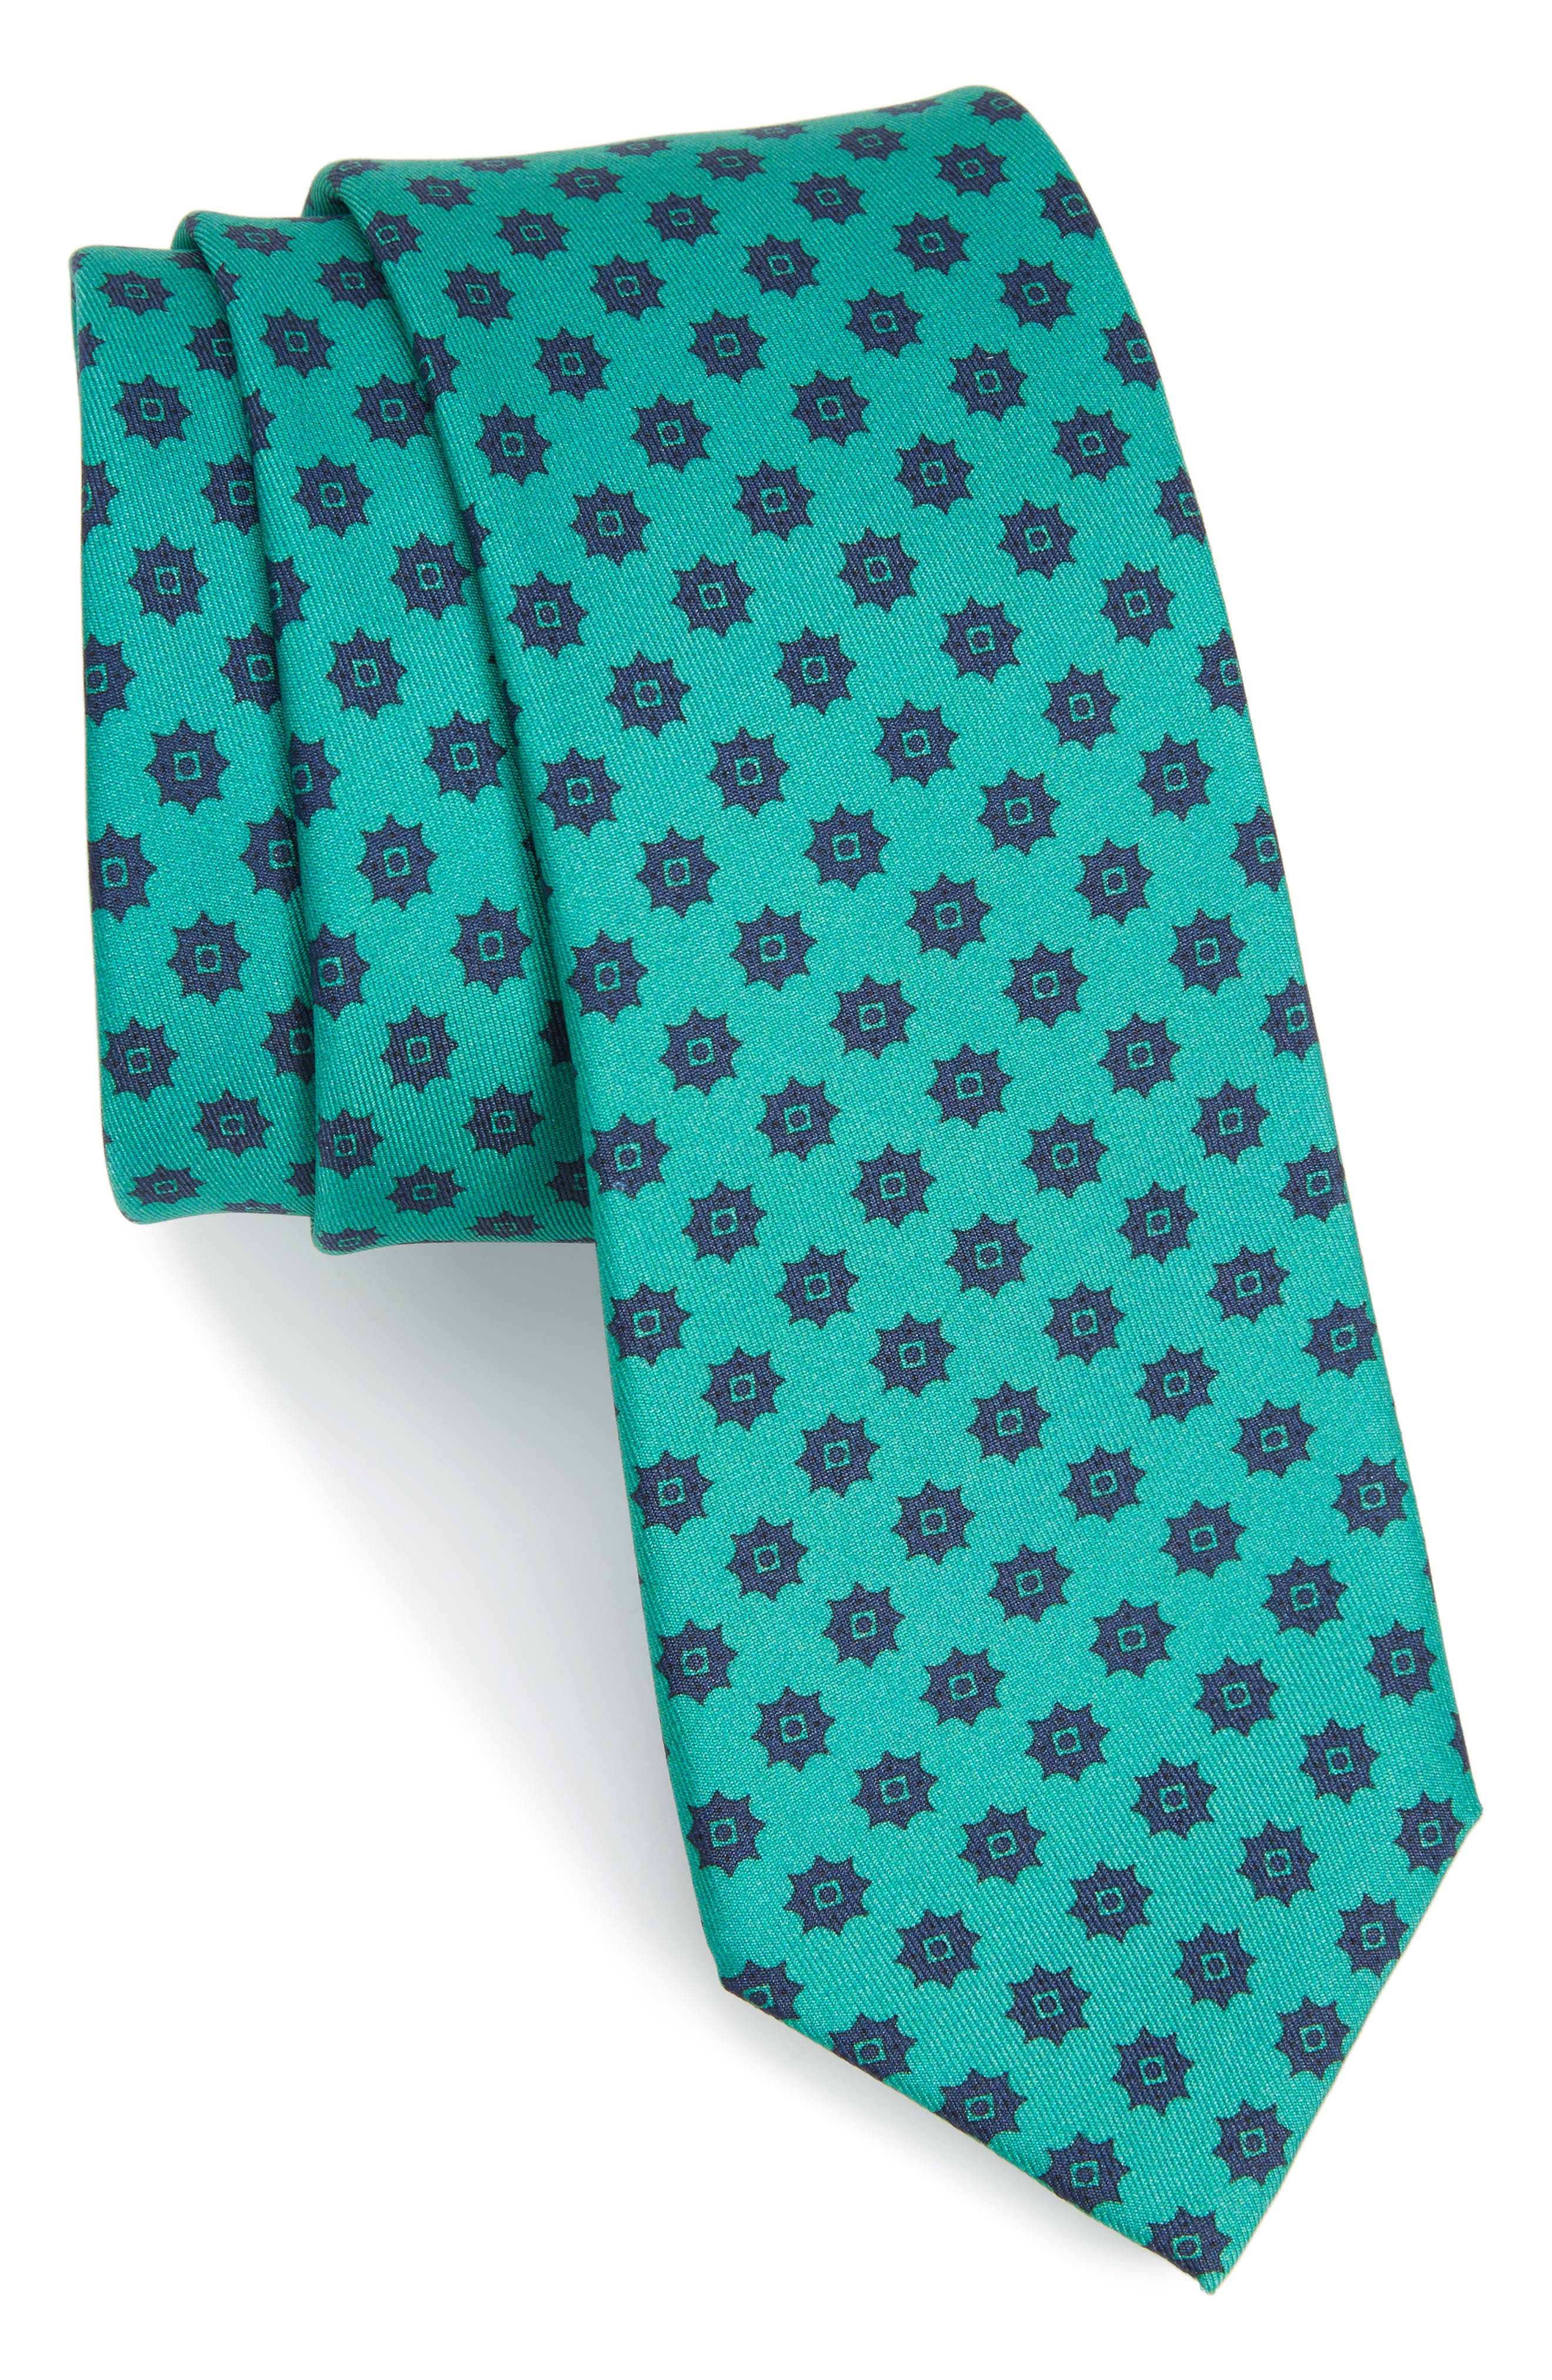 Main Image - The Tie Bar Major Star Silk Tie